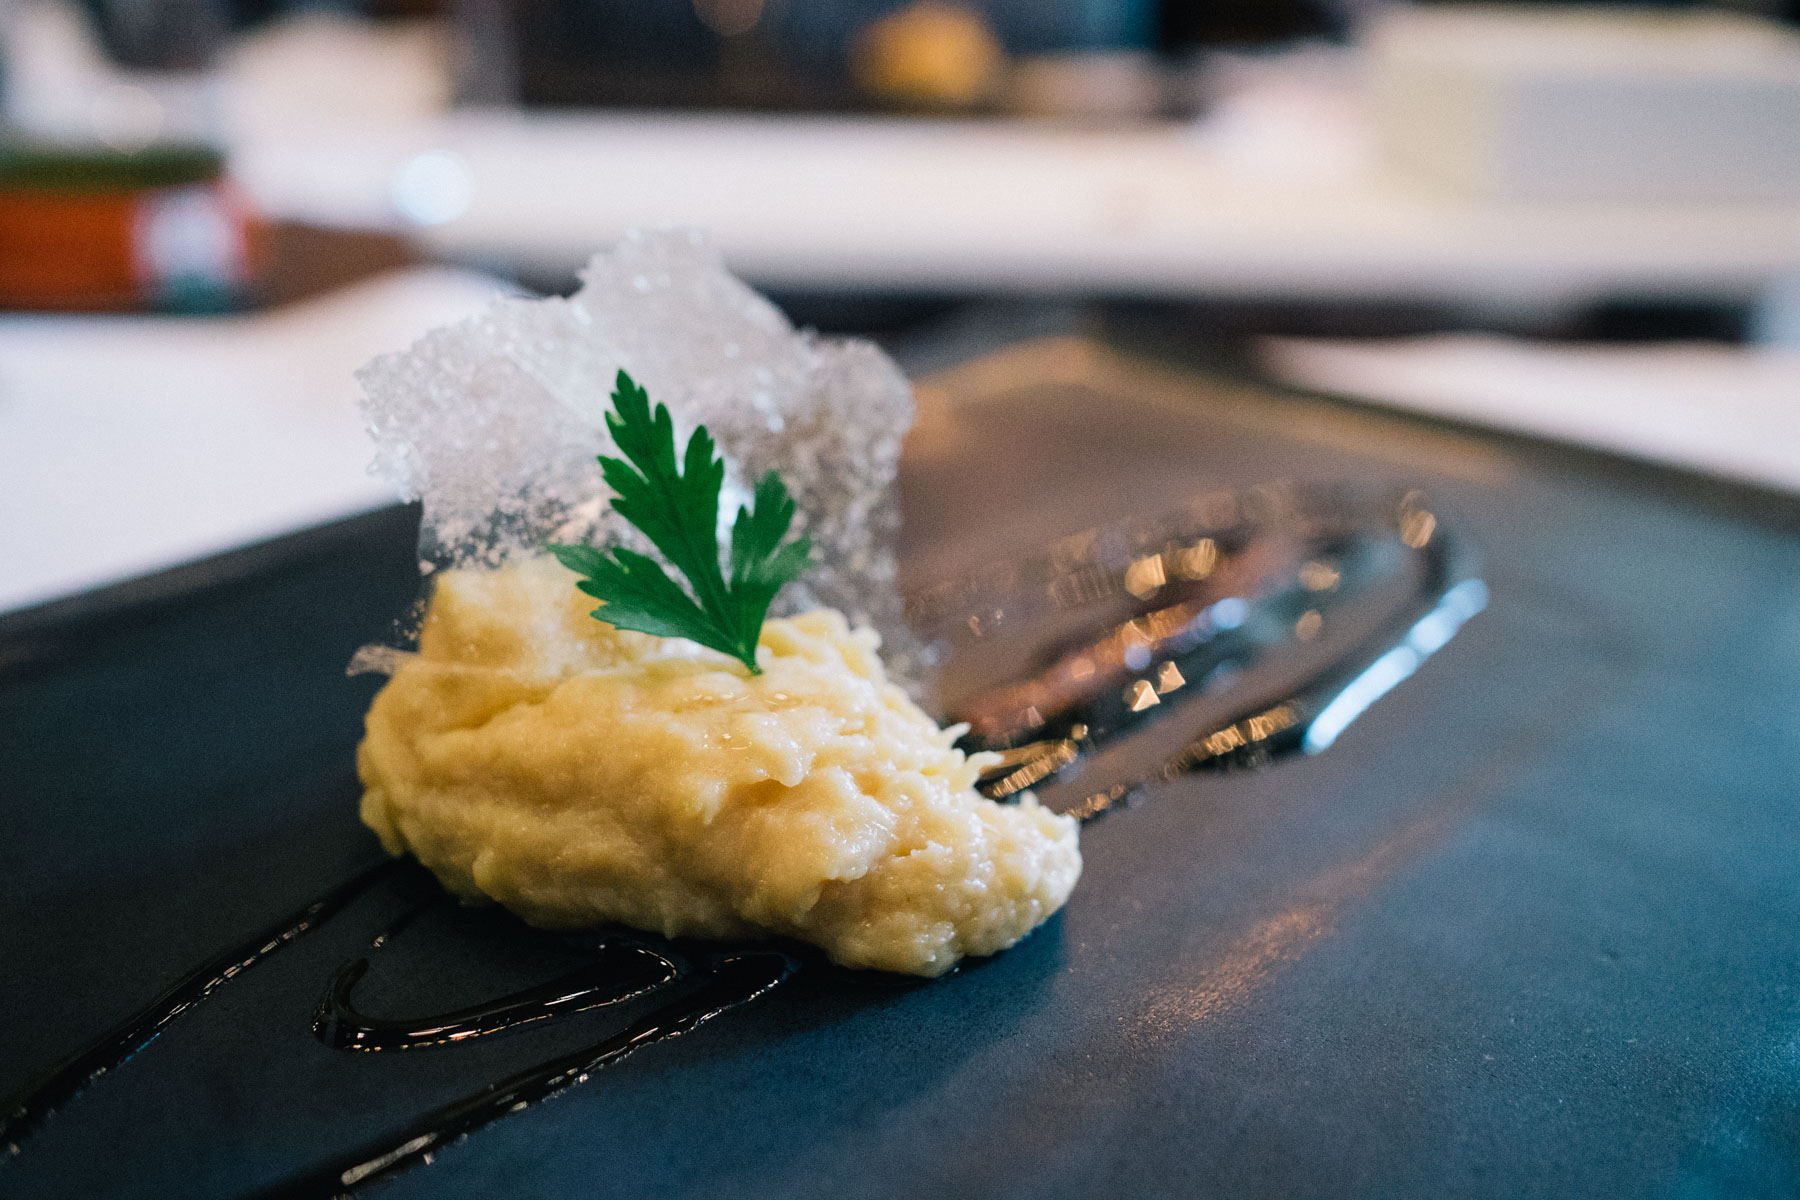 sao-paulo-worlds-best-restaurant-dom-brazil-brasil-michelin-star-8